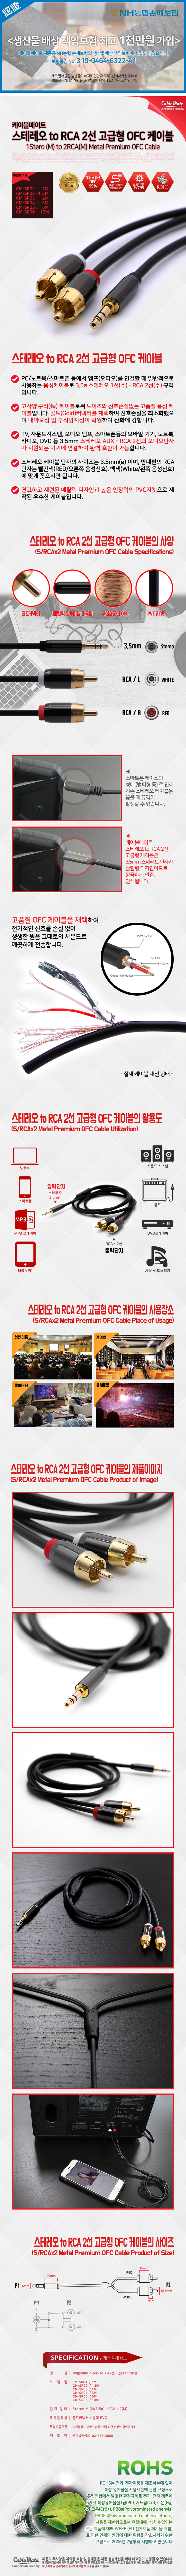 CABLEMATE  스테레오 to RCA 2선 고급형 케이블(1m, CM-SR01)